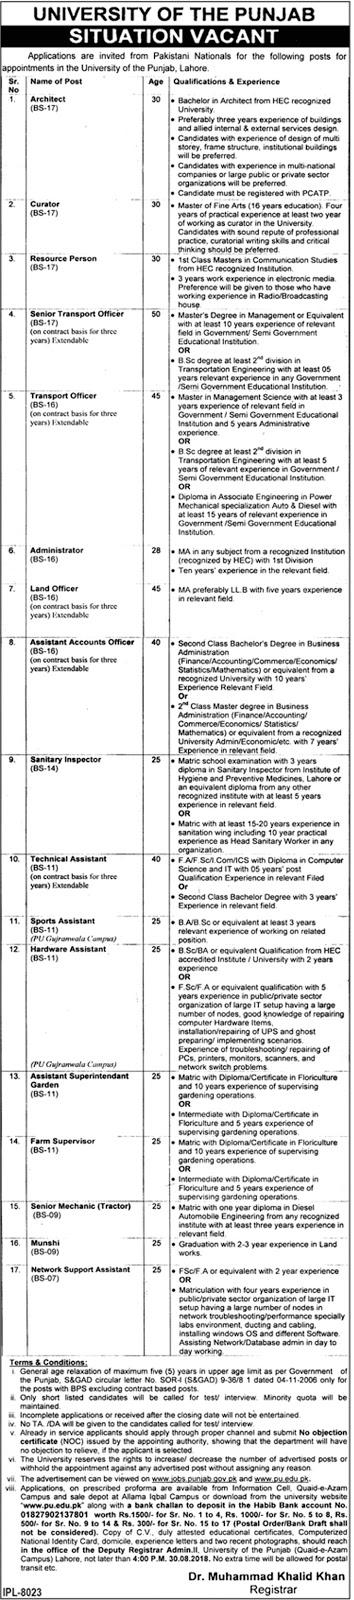 PU August 2018 Jobs, University of Punjab